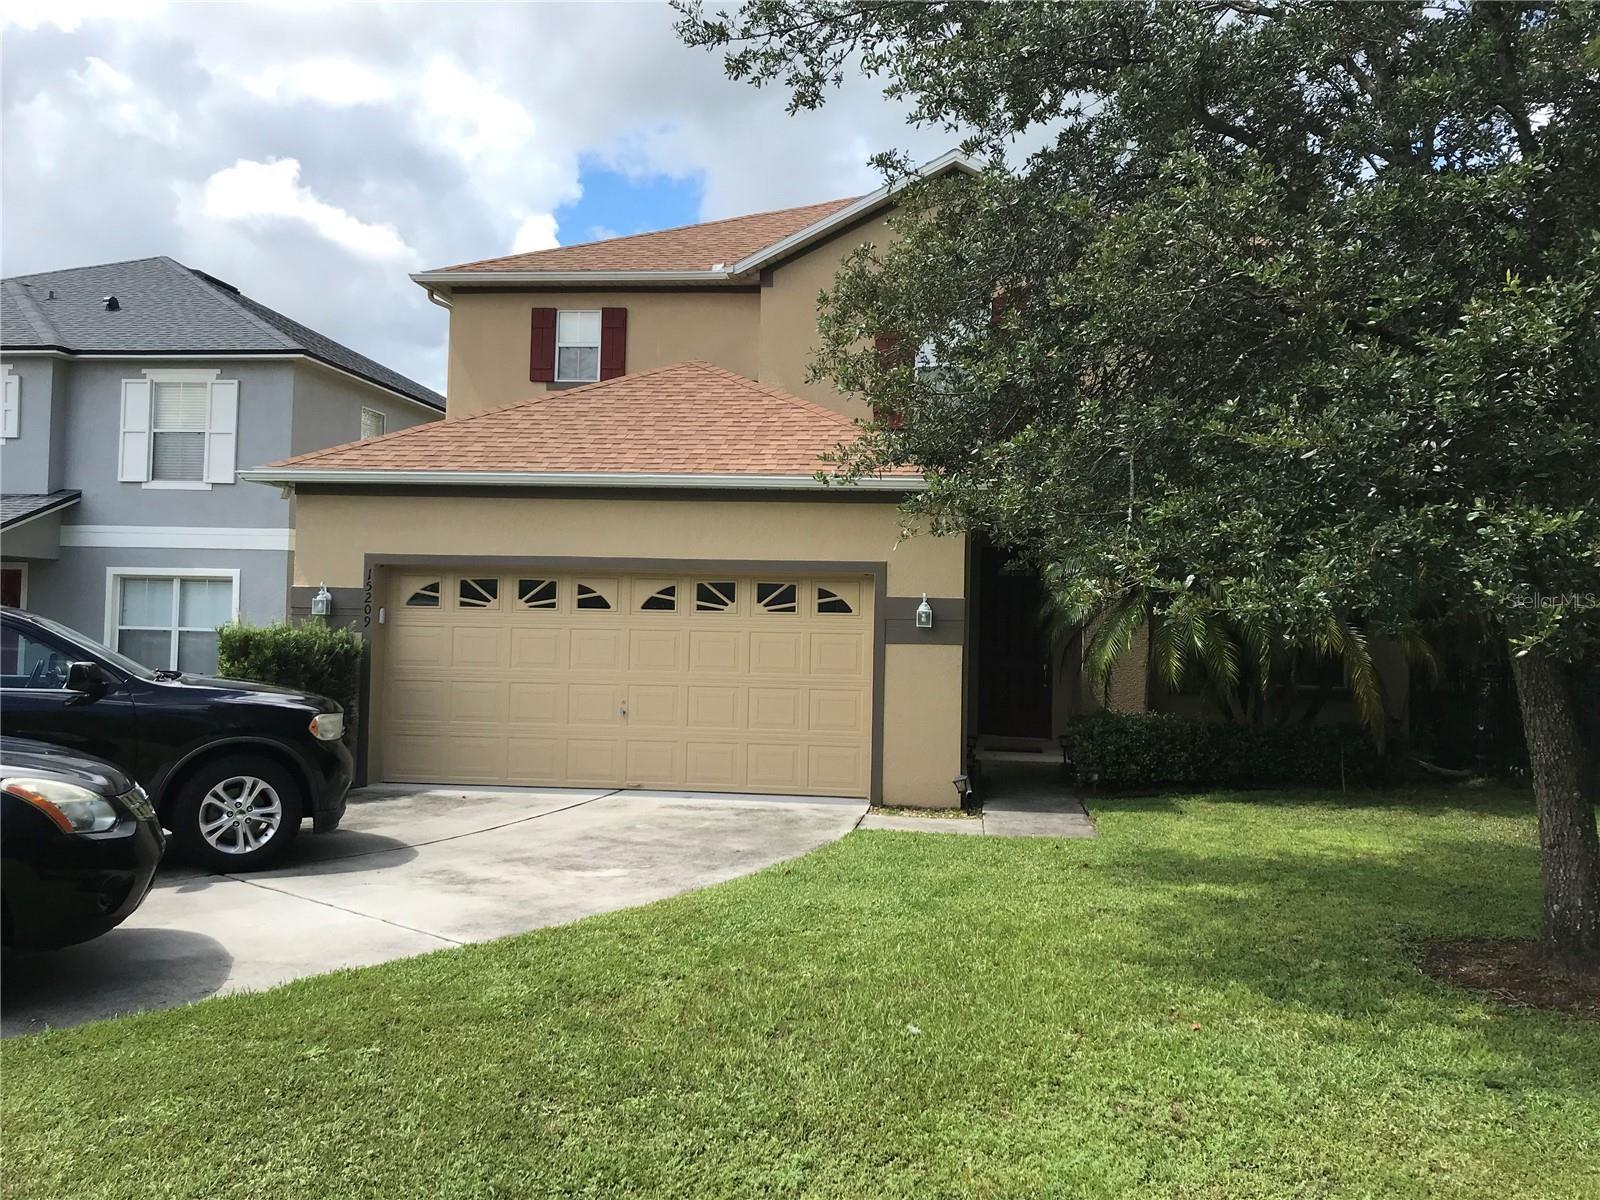 15209 GALBI DRIVE, Orlando, FL 32828 - #: O5976779